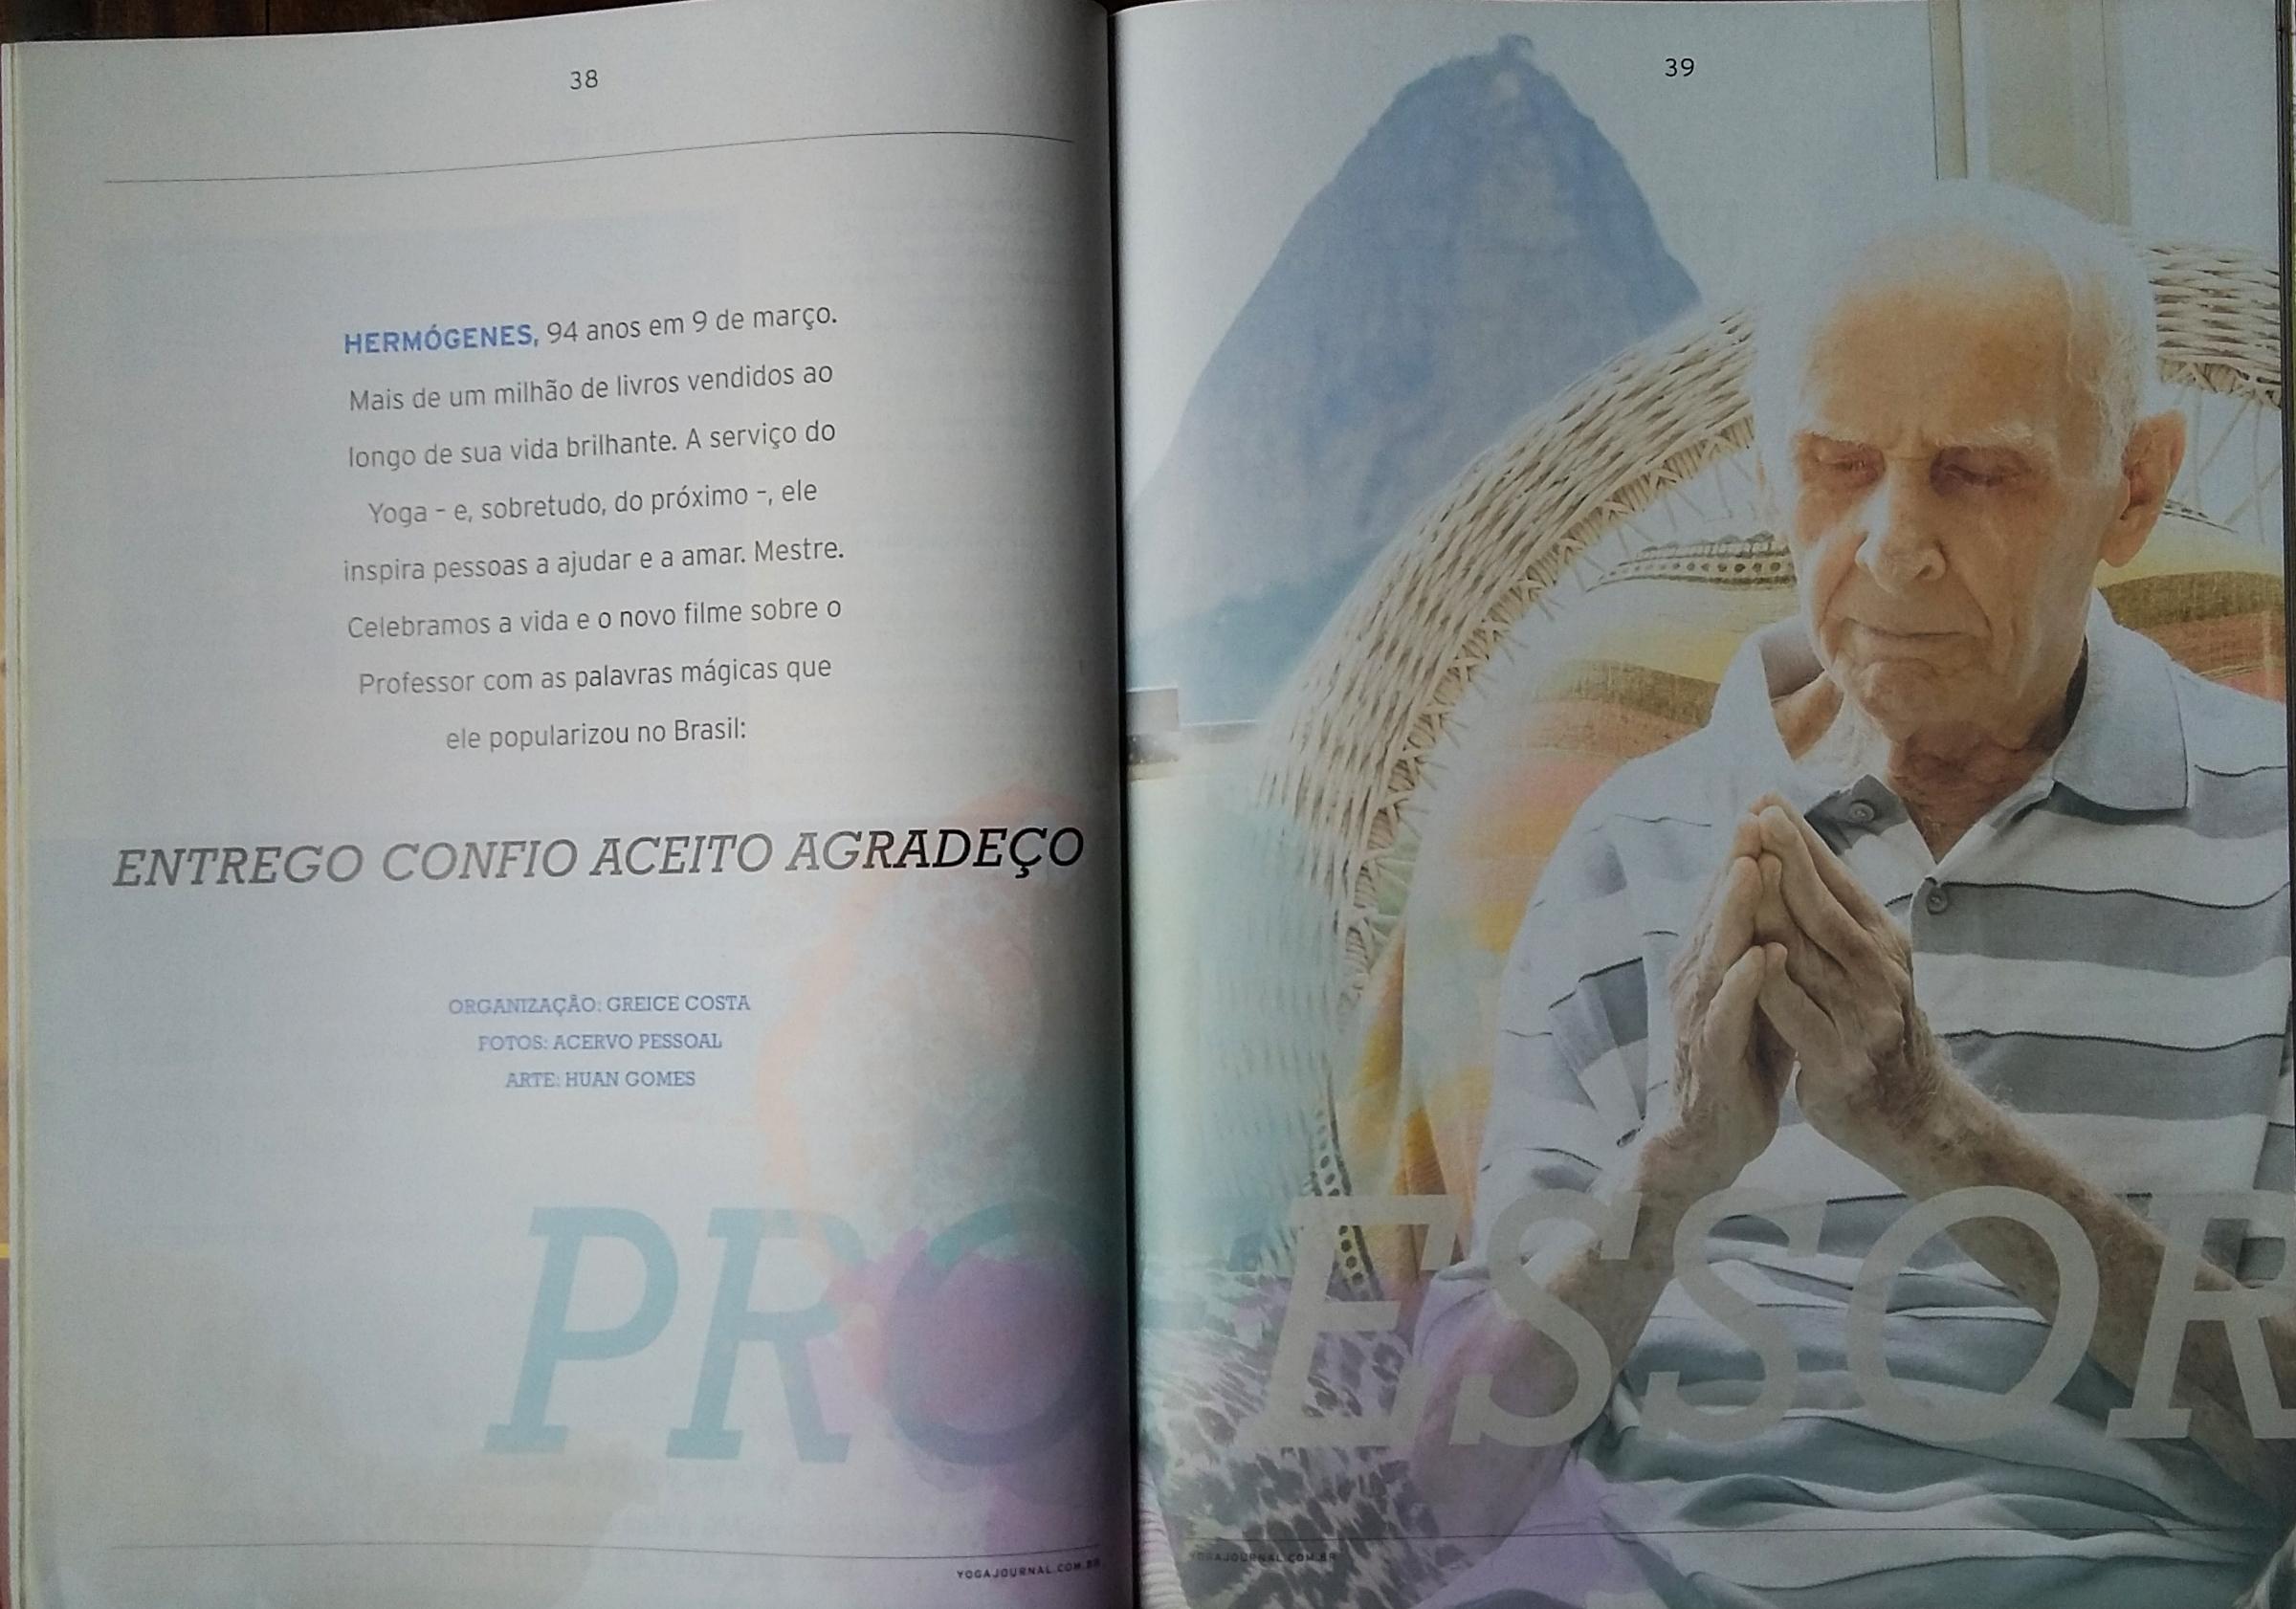 YogaJournal-Hermogenes-capa2.jpg